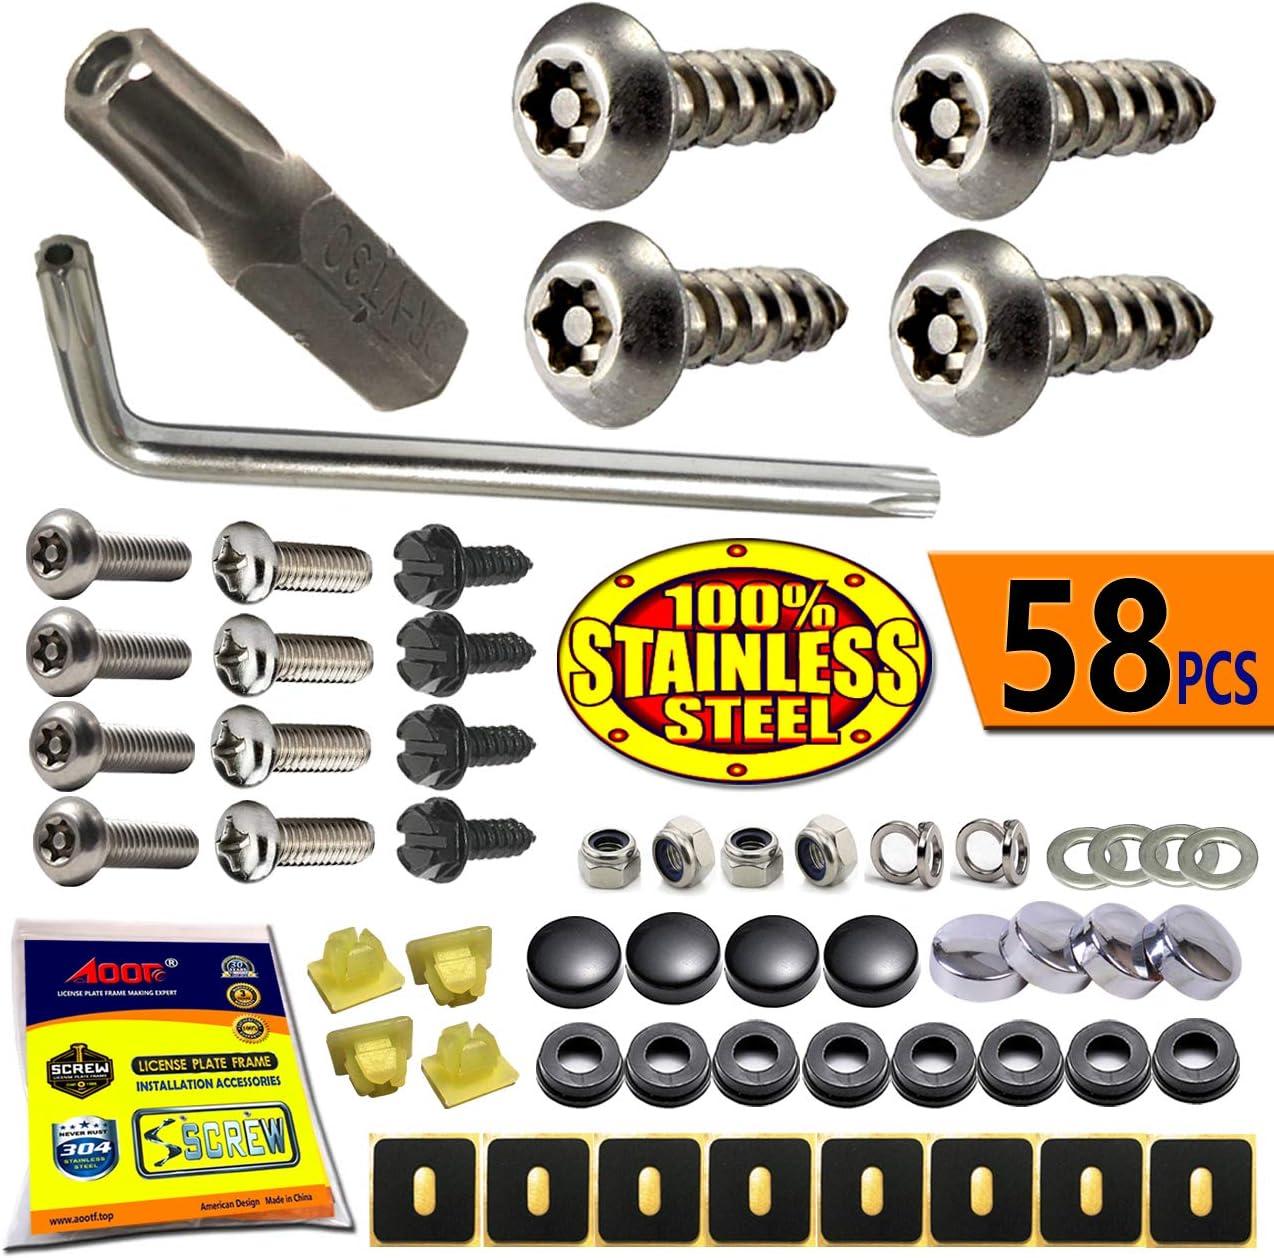 Stainless Steel License Plate Frame Screws Fasteners Ultimate Kit Domestic Im...